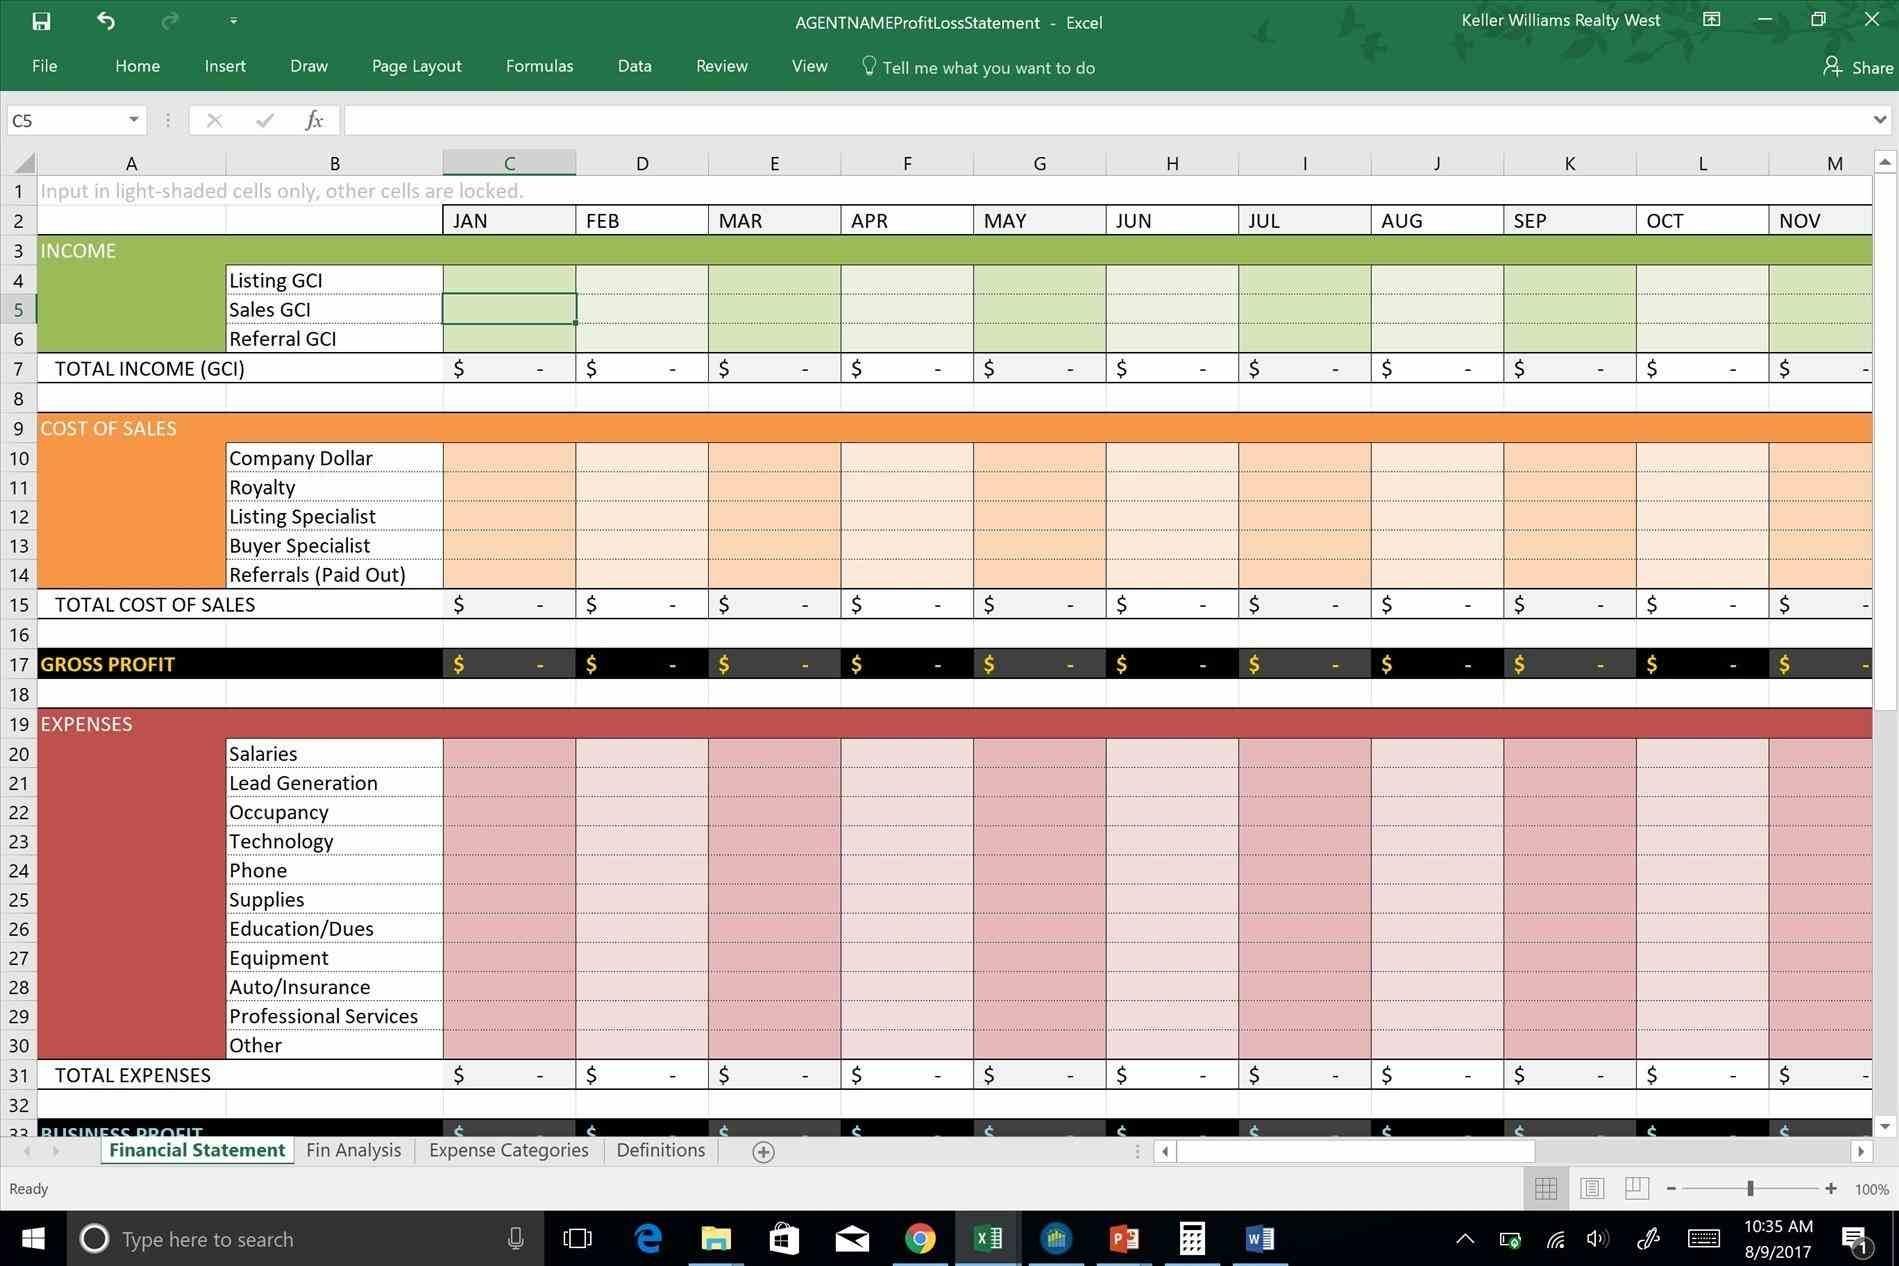 Commission Tracking Spreadsheet Spreadsheet Softwar Real Estate Commission Tracking Spreadsheet